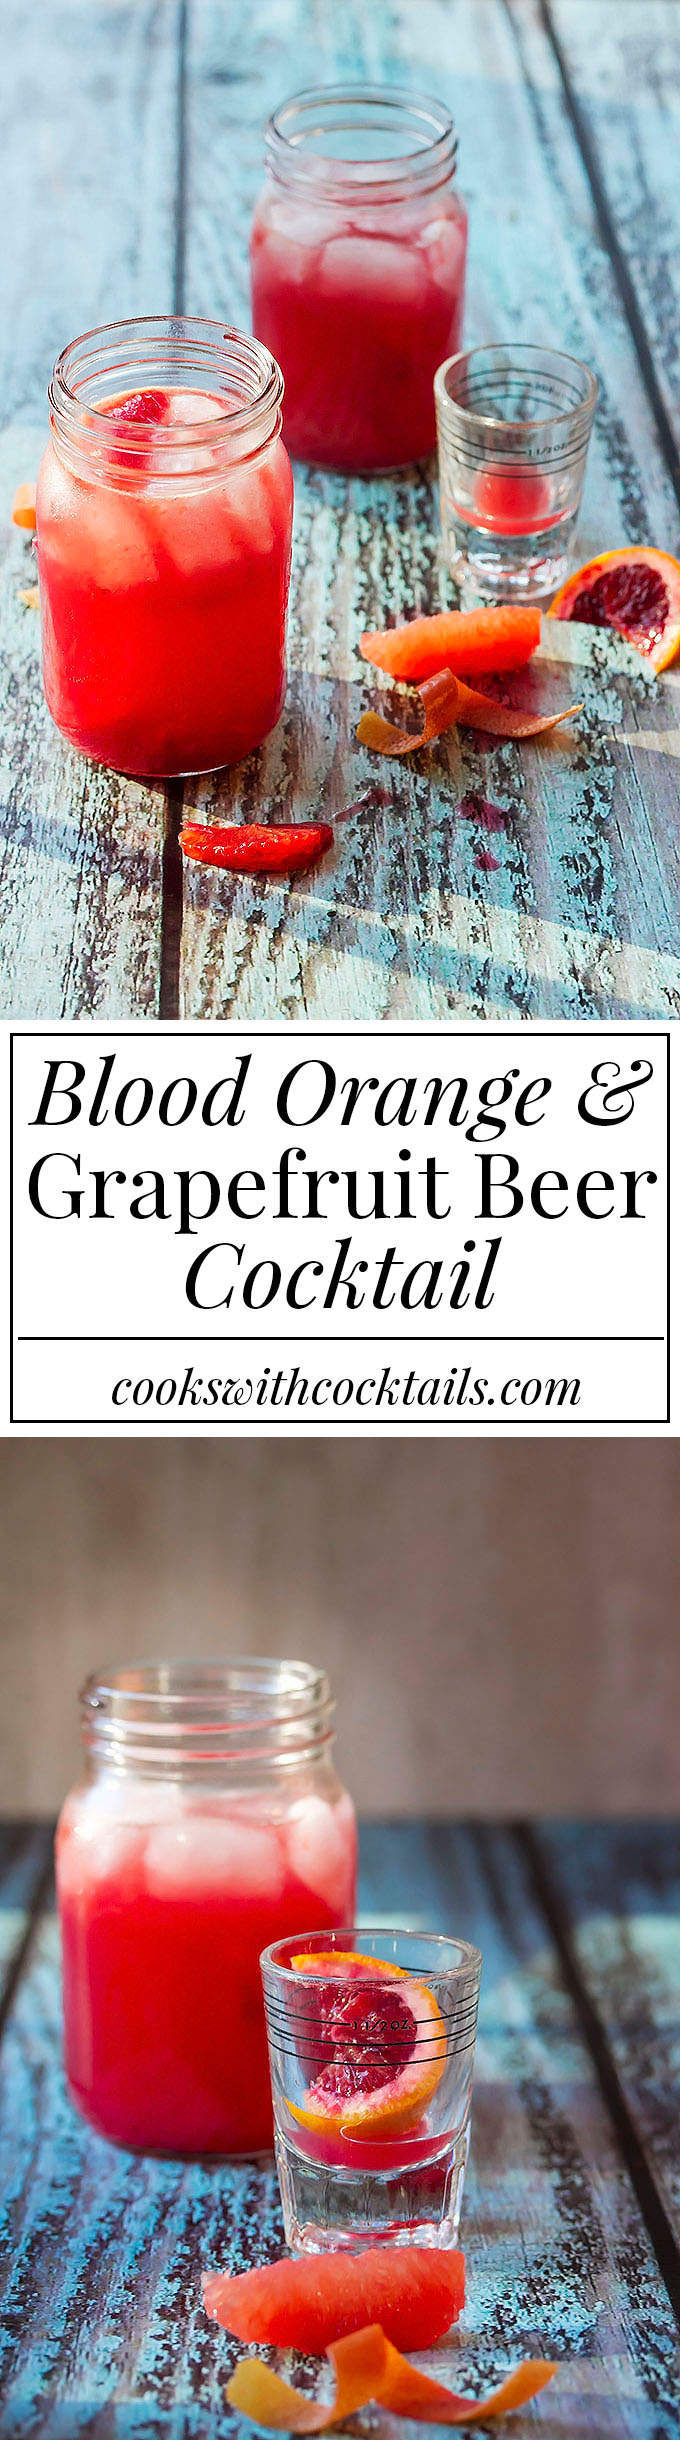 Blood Orange & Grapefruit Beer Cocktail